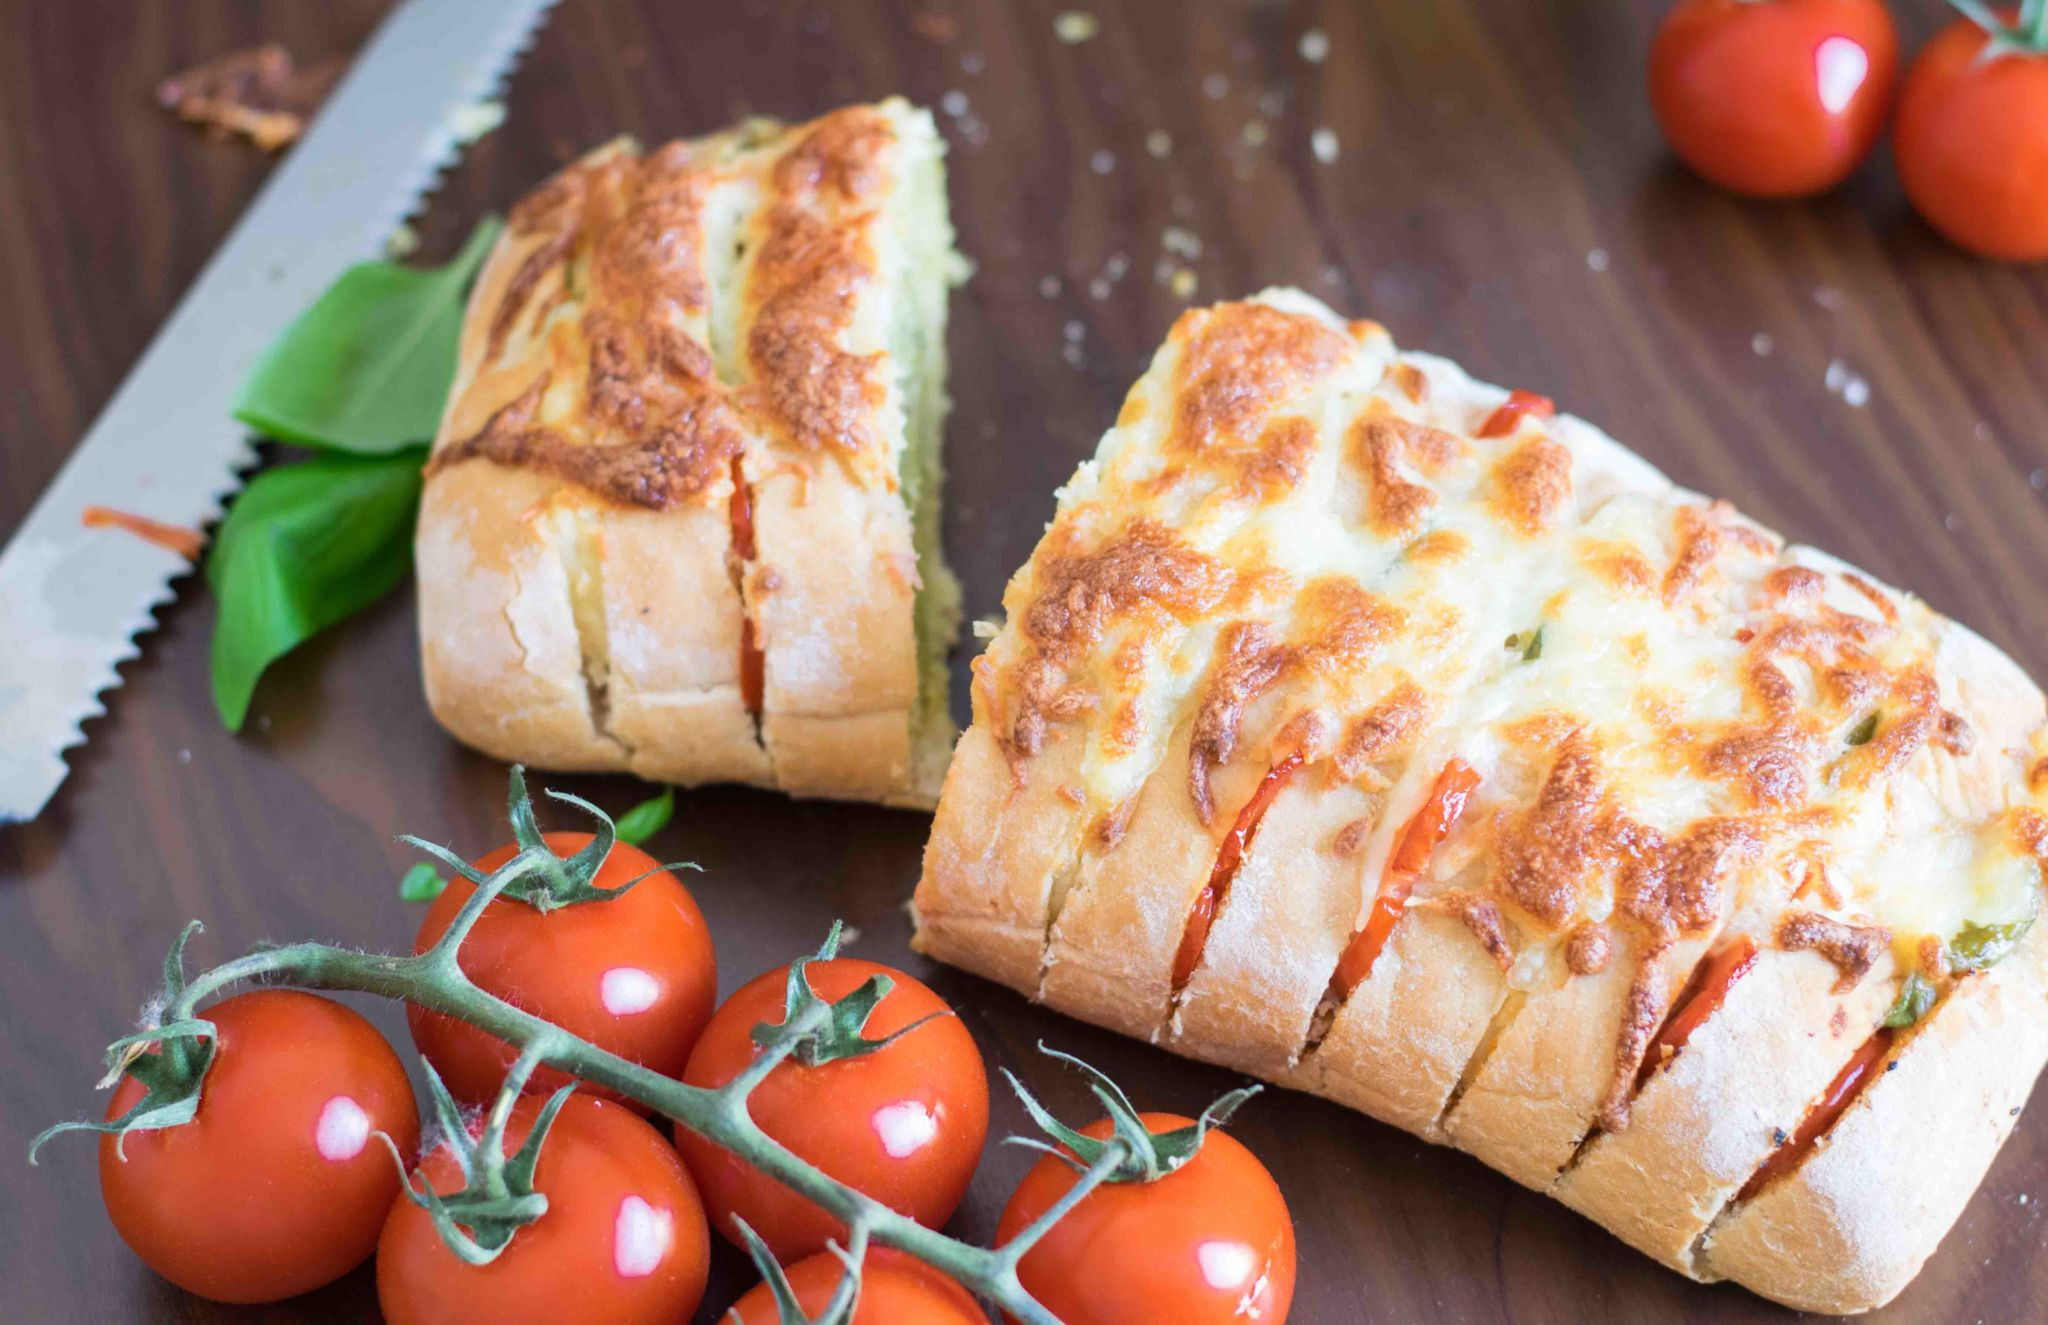 Italienisches Partybrot – Ciabatta auf andere Art!